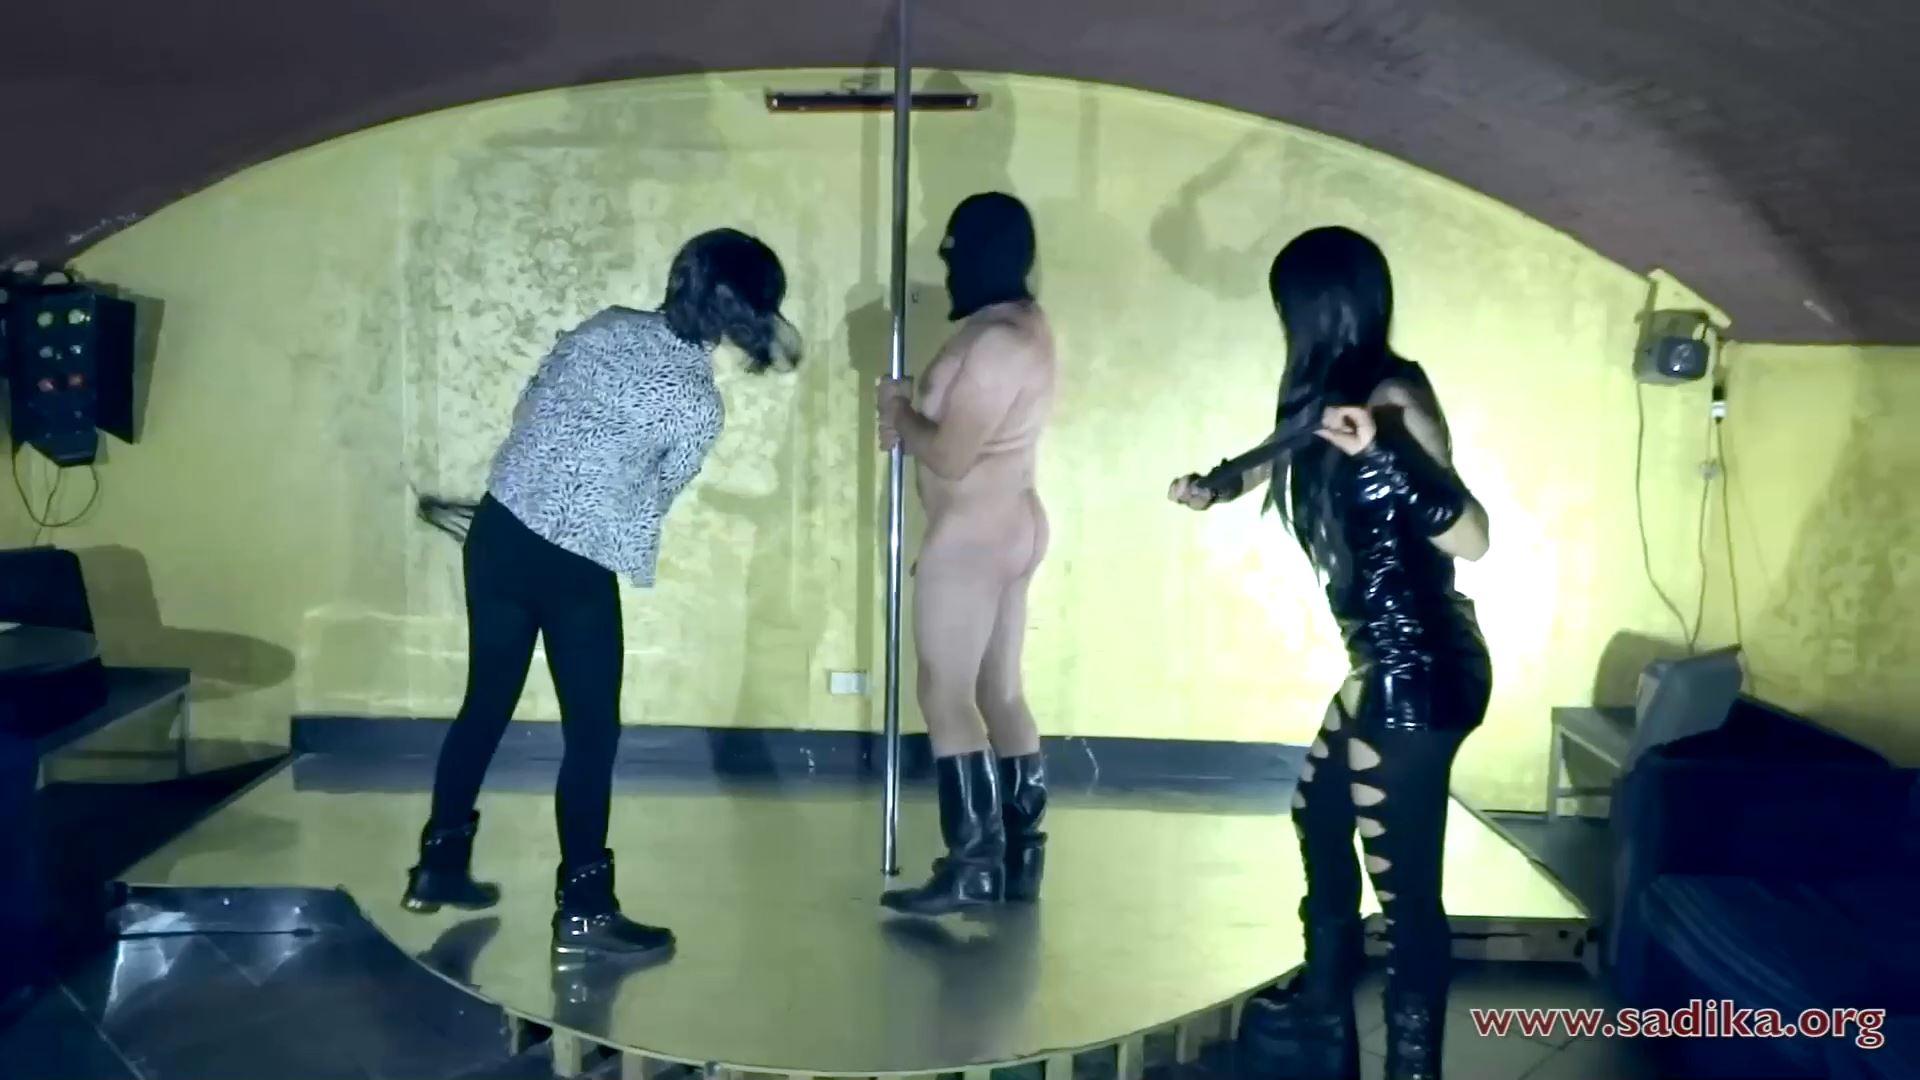 Jennyfer Cruel In Scene: Whip The Pig - WOMEN WEIGHT / SADIKA - FULL HD/1080p/MP4